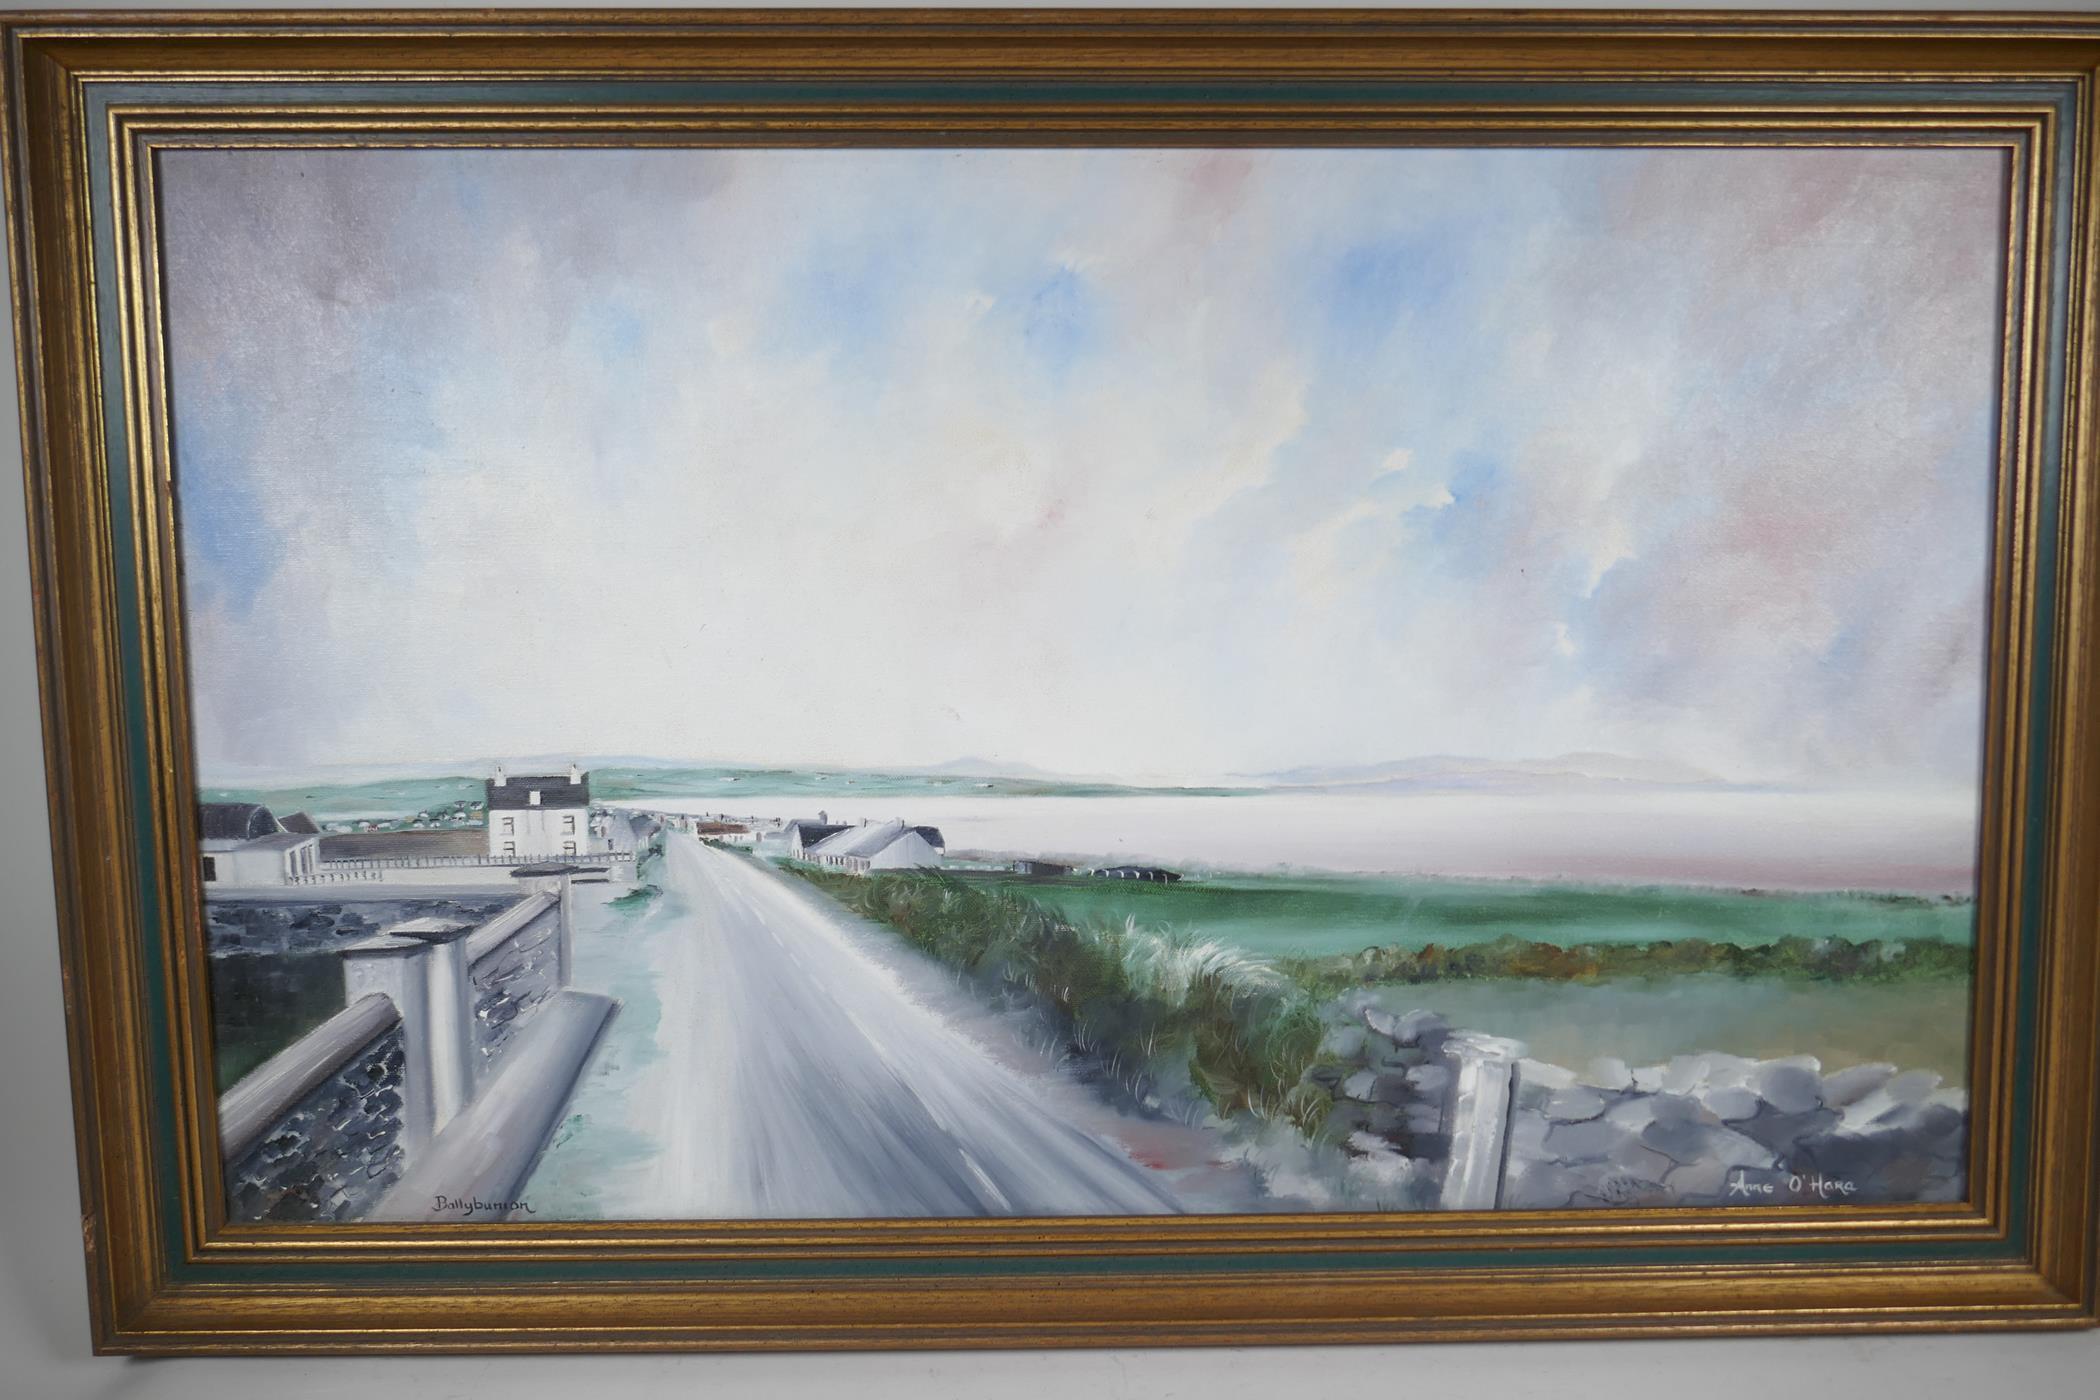 "Anne O' Hara, Irish coastal landscape, titled 'Ballybunion', signed, oil on canvas, 30"" x 18"" - Image 3 of 5"